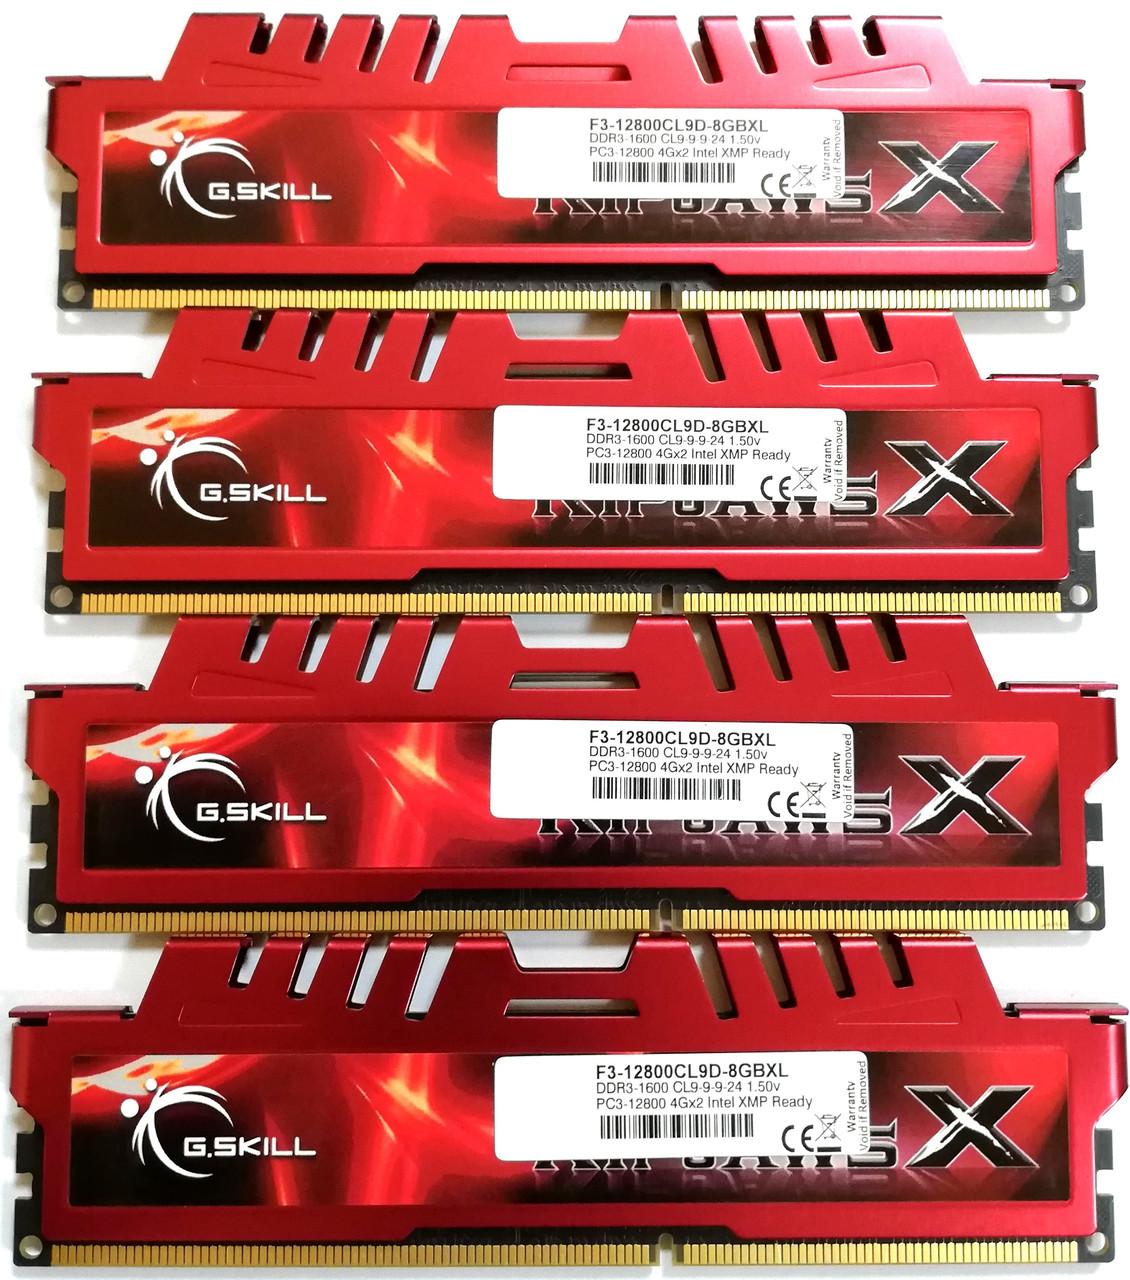 Комплект оперативной памяти G.Skill RipjawsX DDR3 16Gb (4*4Gb) 1600MHz PC3 12800U CL9 (F3-12800CL9D-8GBXL) Б/У